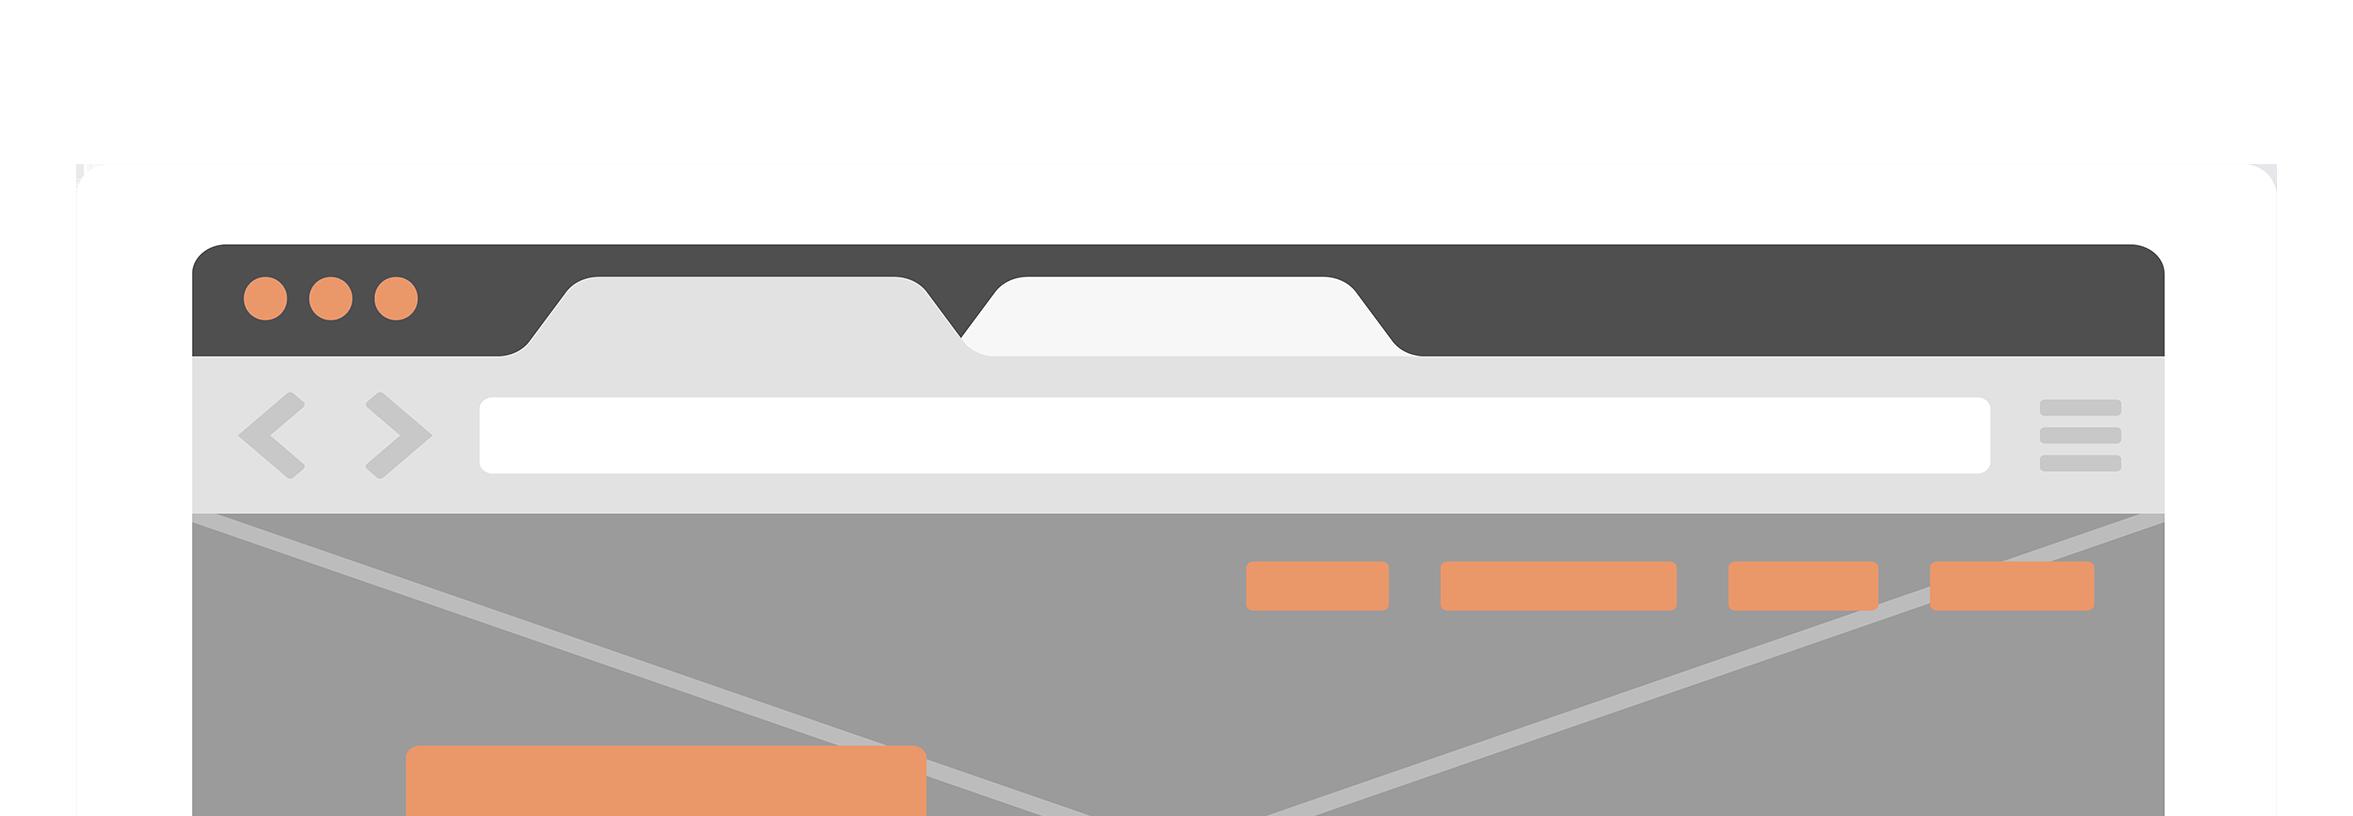 Mockup of a website on an iPad